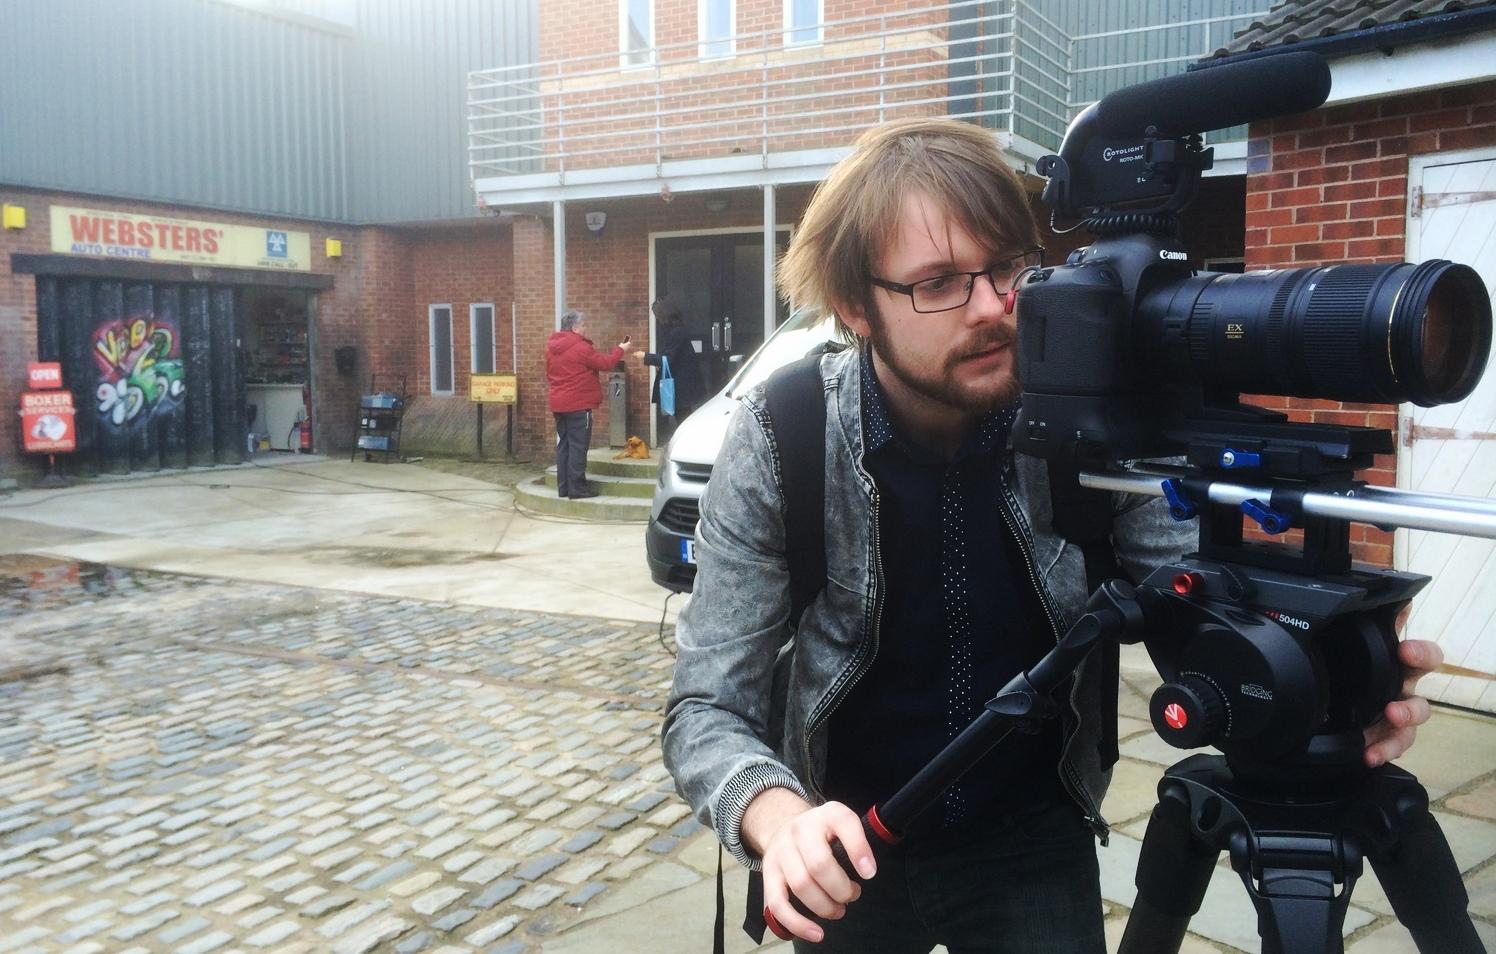 APV filming on Coronation Street for the IABM